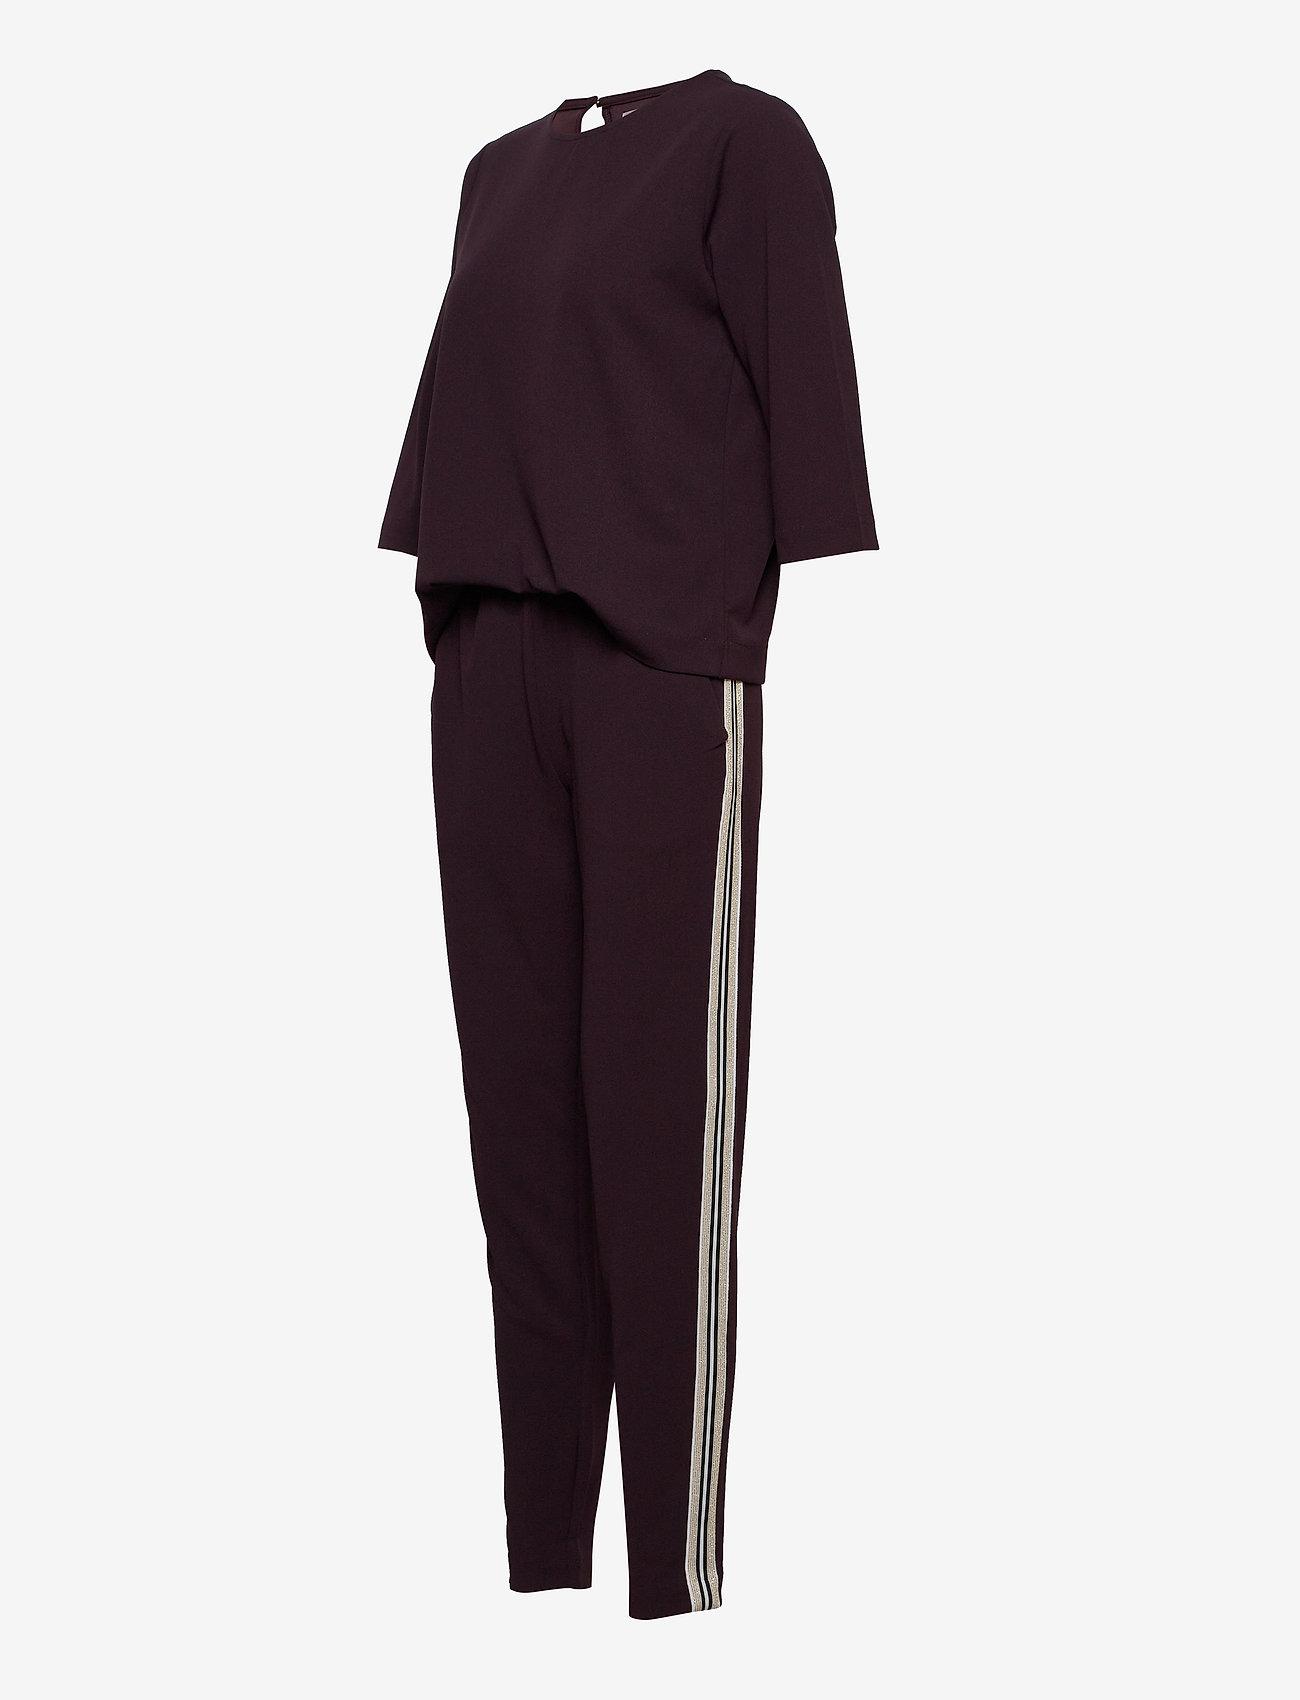 Soyaconcept - SC-MASCHA - clothing - maroon - 1